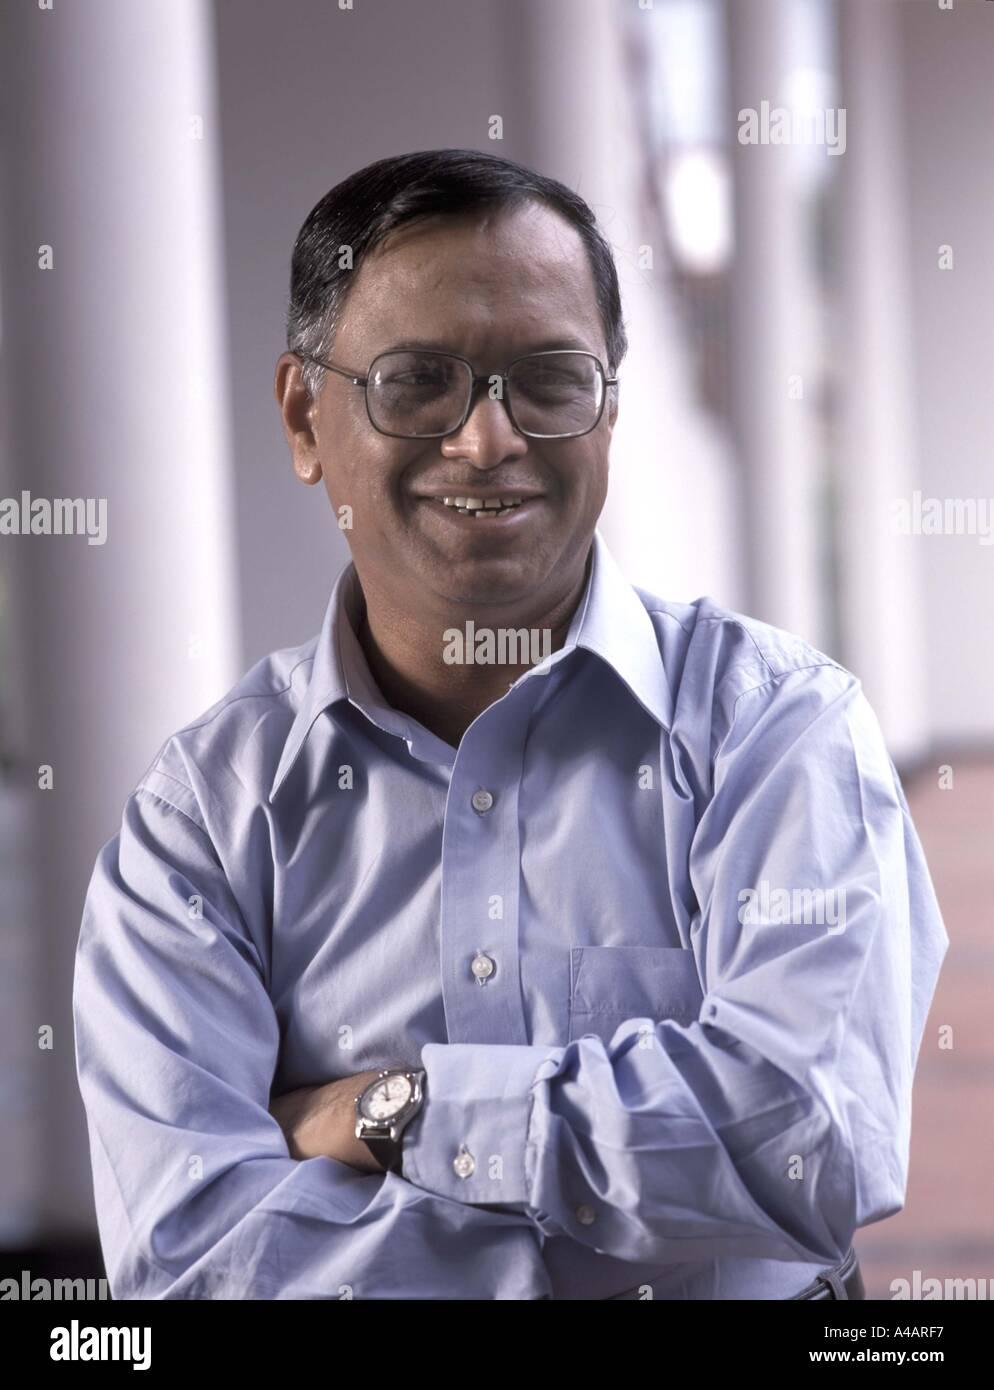 Nr Narayana Murthy presidente di infosys Bangalore in India Immagini Stock